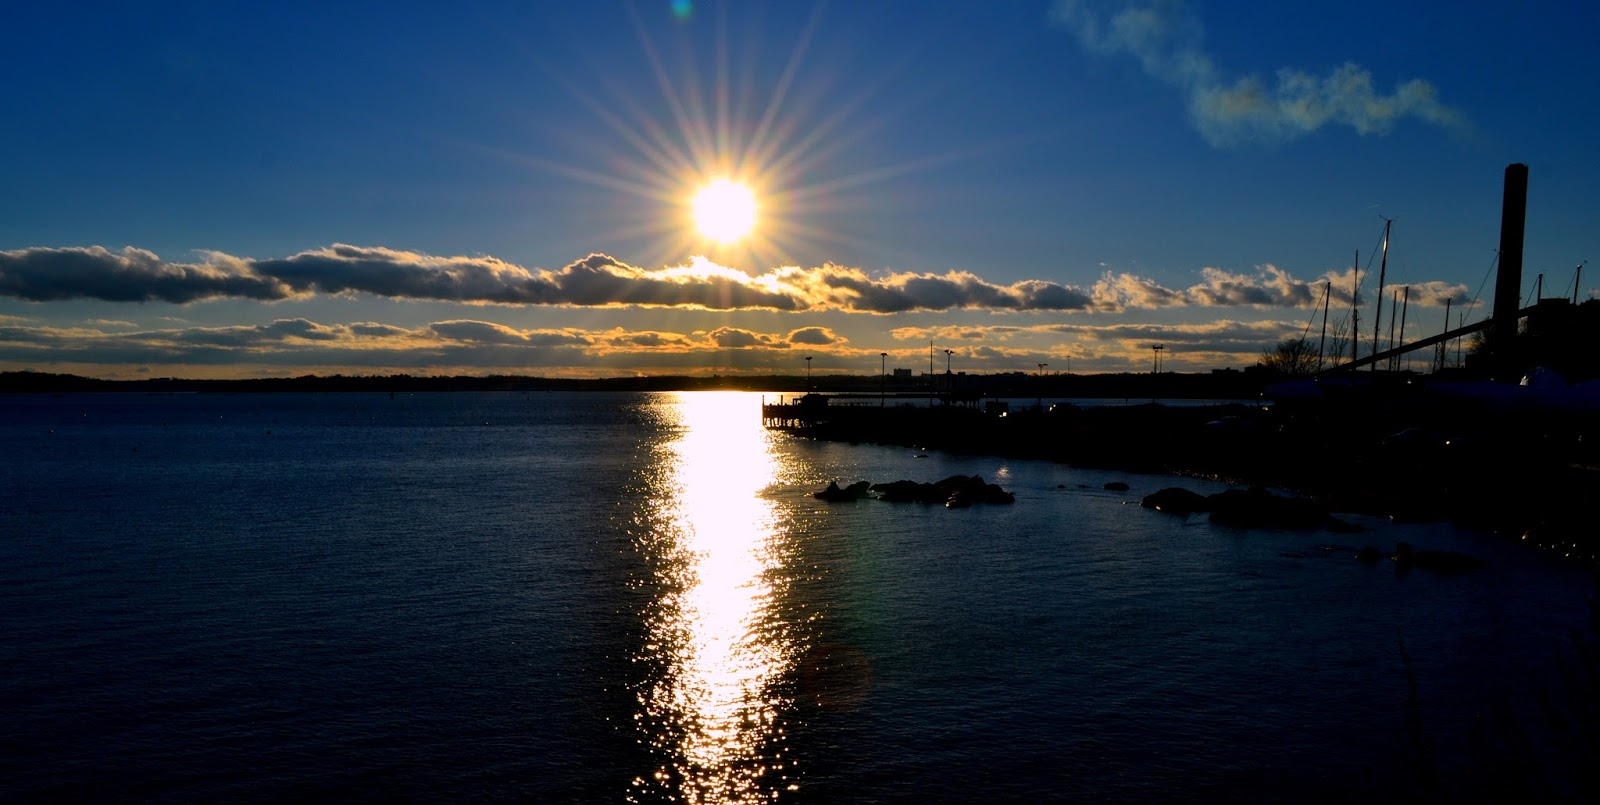 bright, sunset, salem, salem harbor, water, shiny, wet